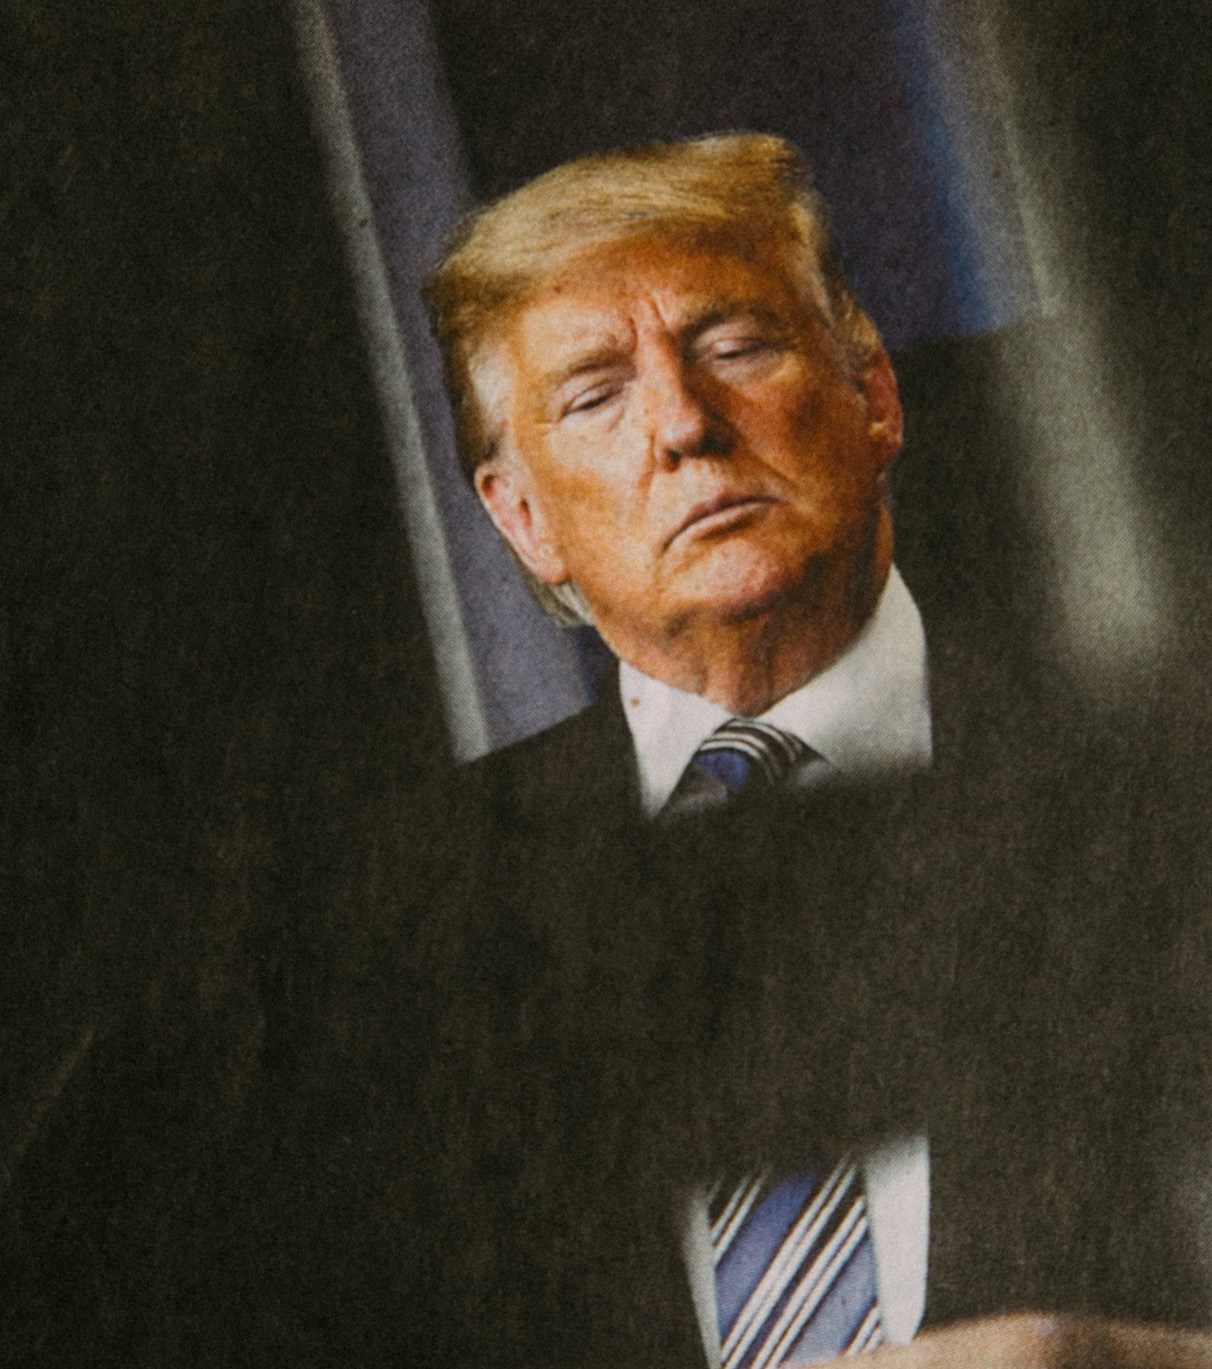 Photo of Donald Trump